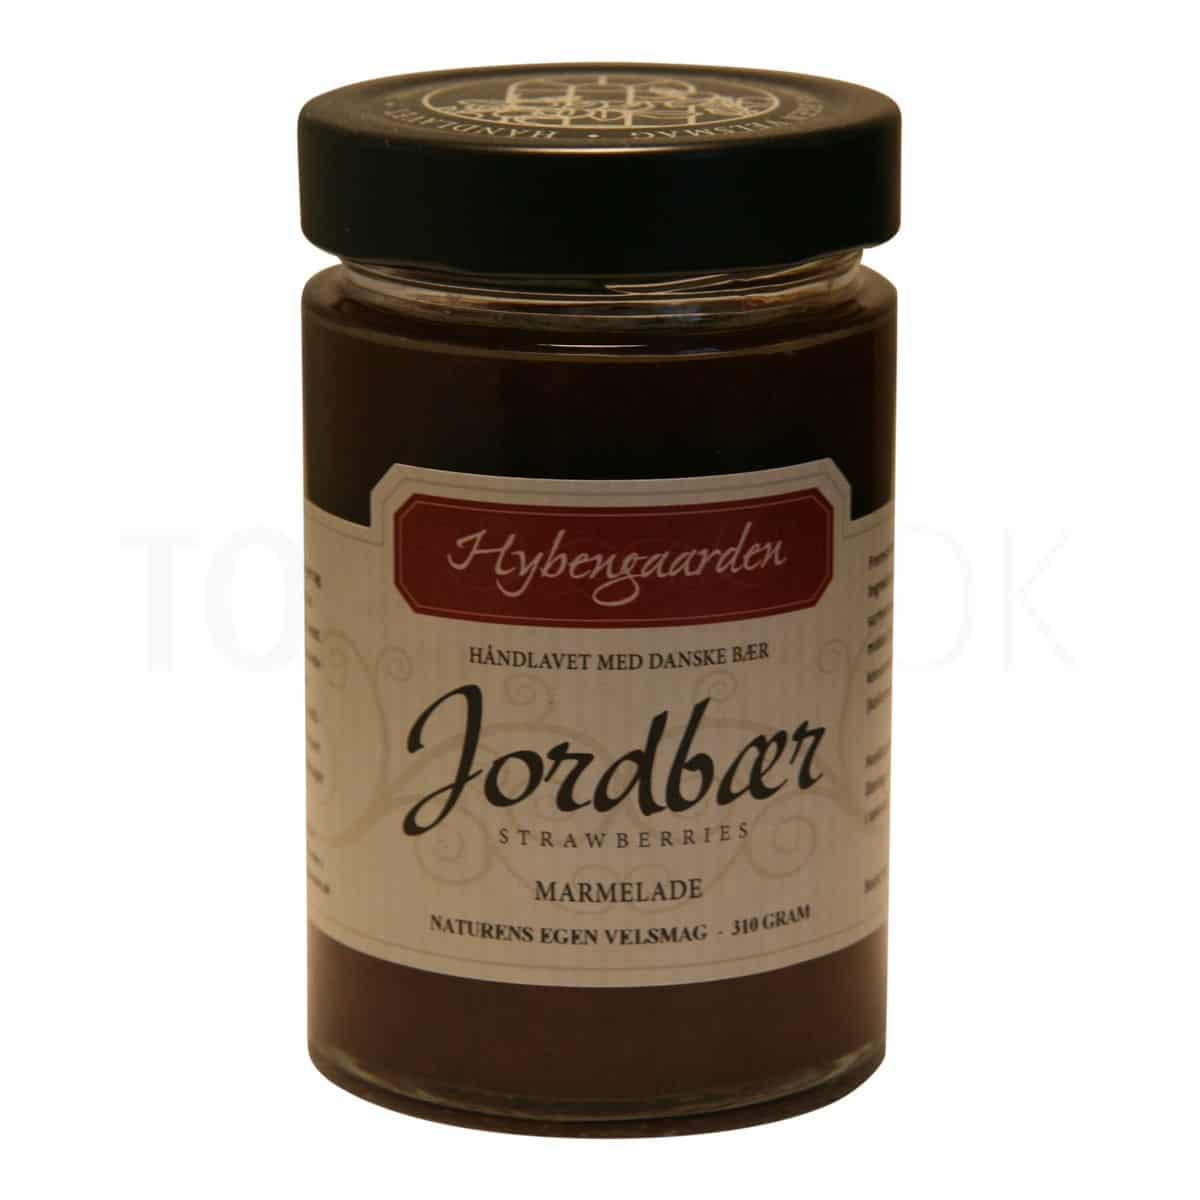 Topvine Hybengaarden jordbaer marmelade